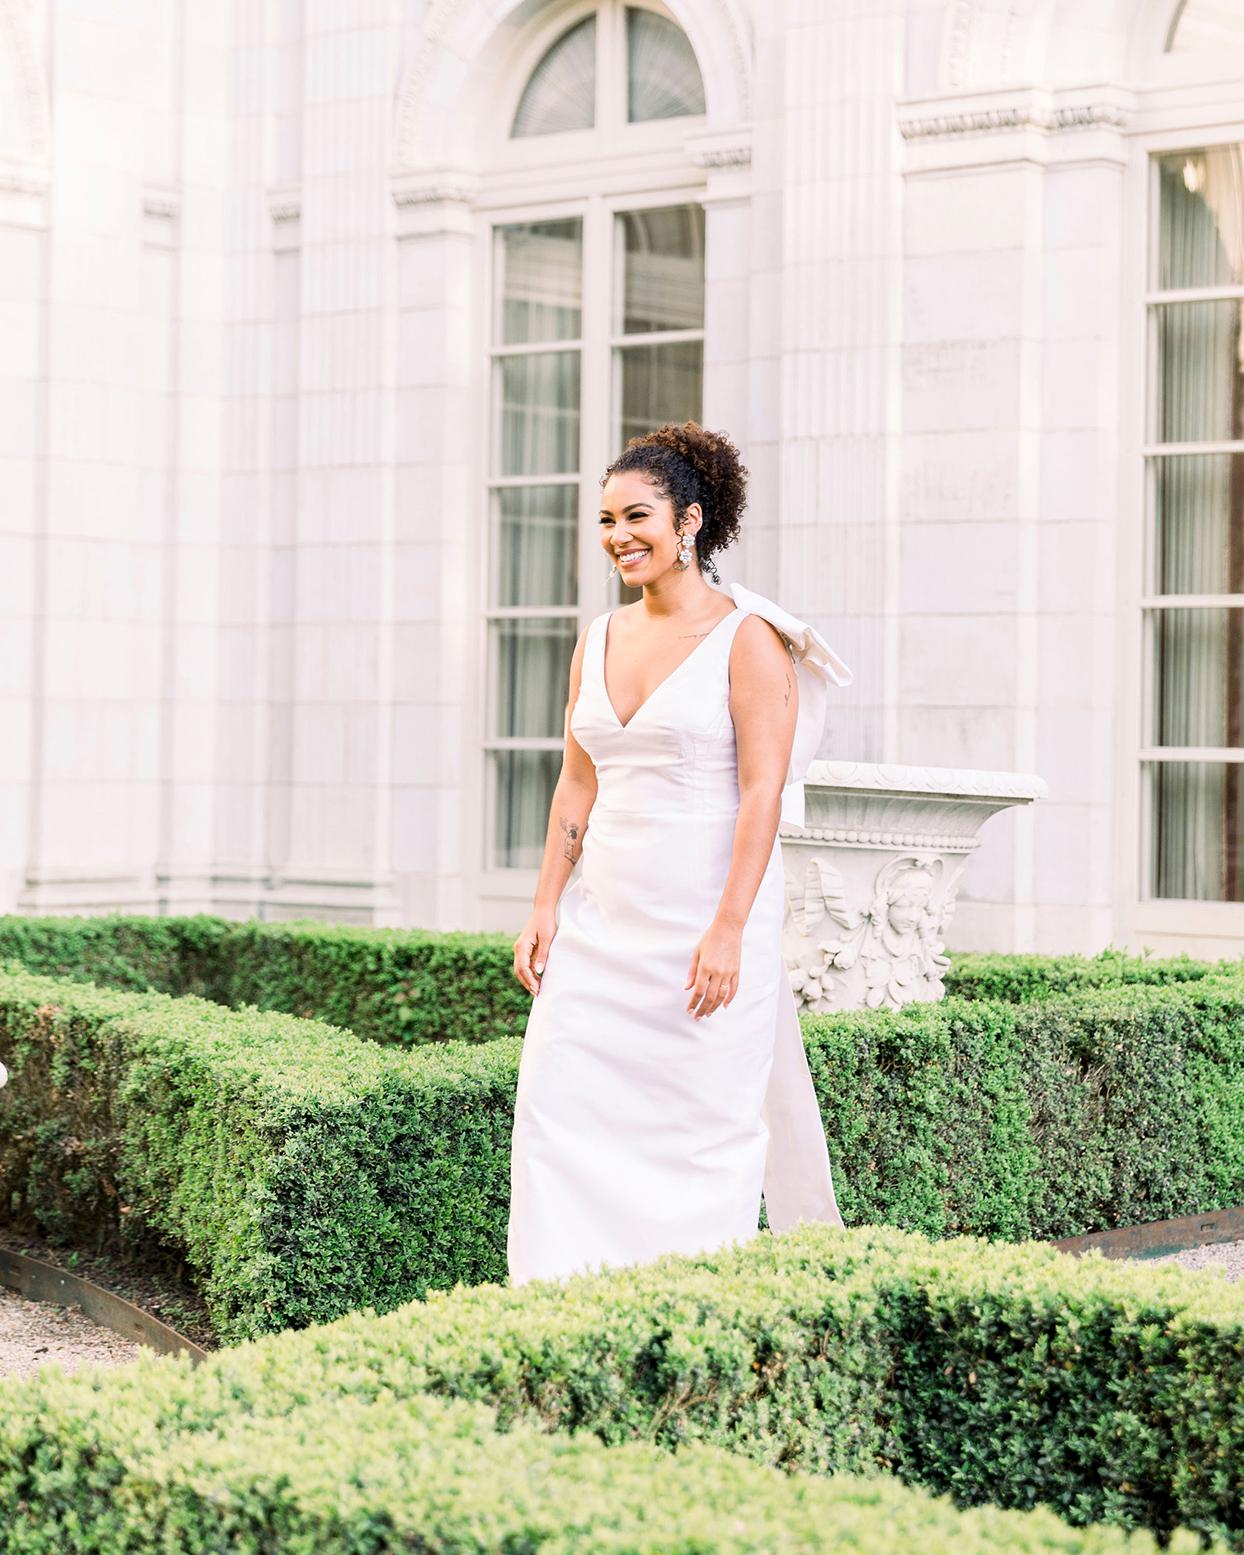 dalila elliot wedding bride dress in garden